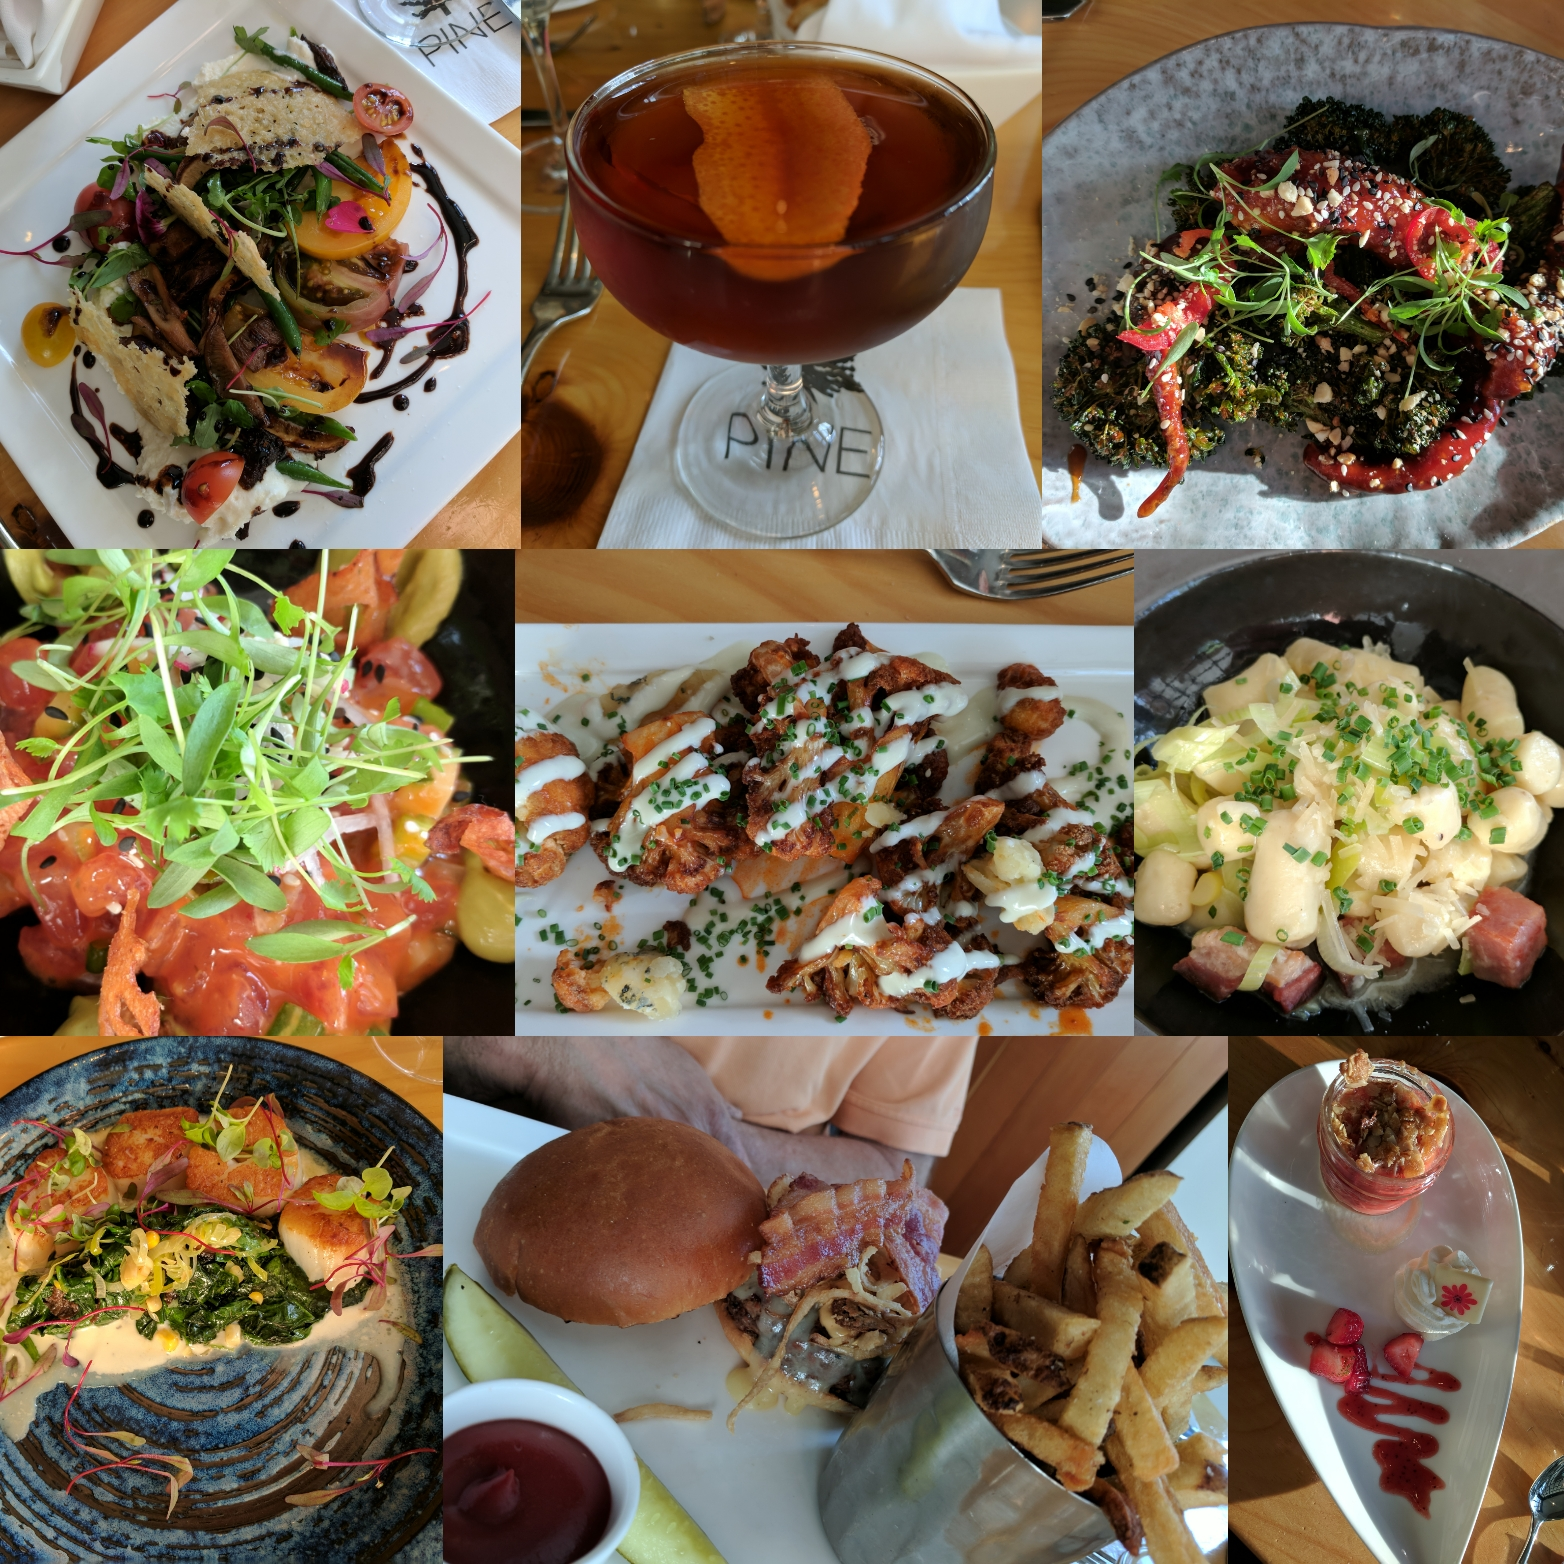 Pine Restaurant Hanover Nh Julie S Dining Club